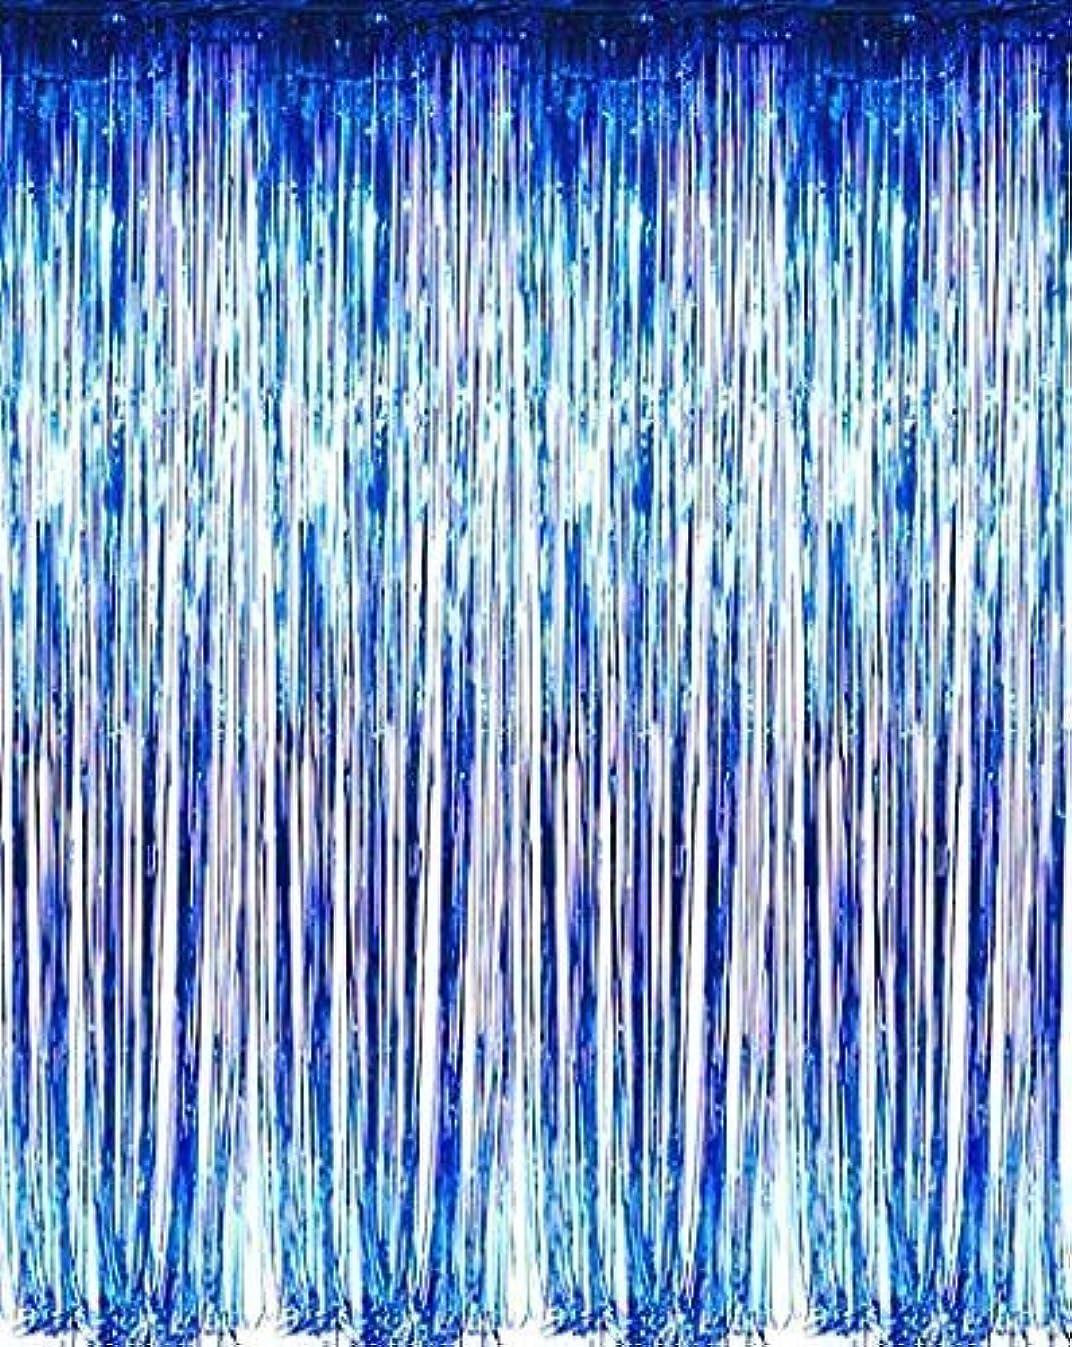 New! Set of 3 Blue Metallic Foil Fringe Door & Window Curtain Party Decoration 3' X 8' (36